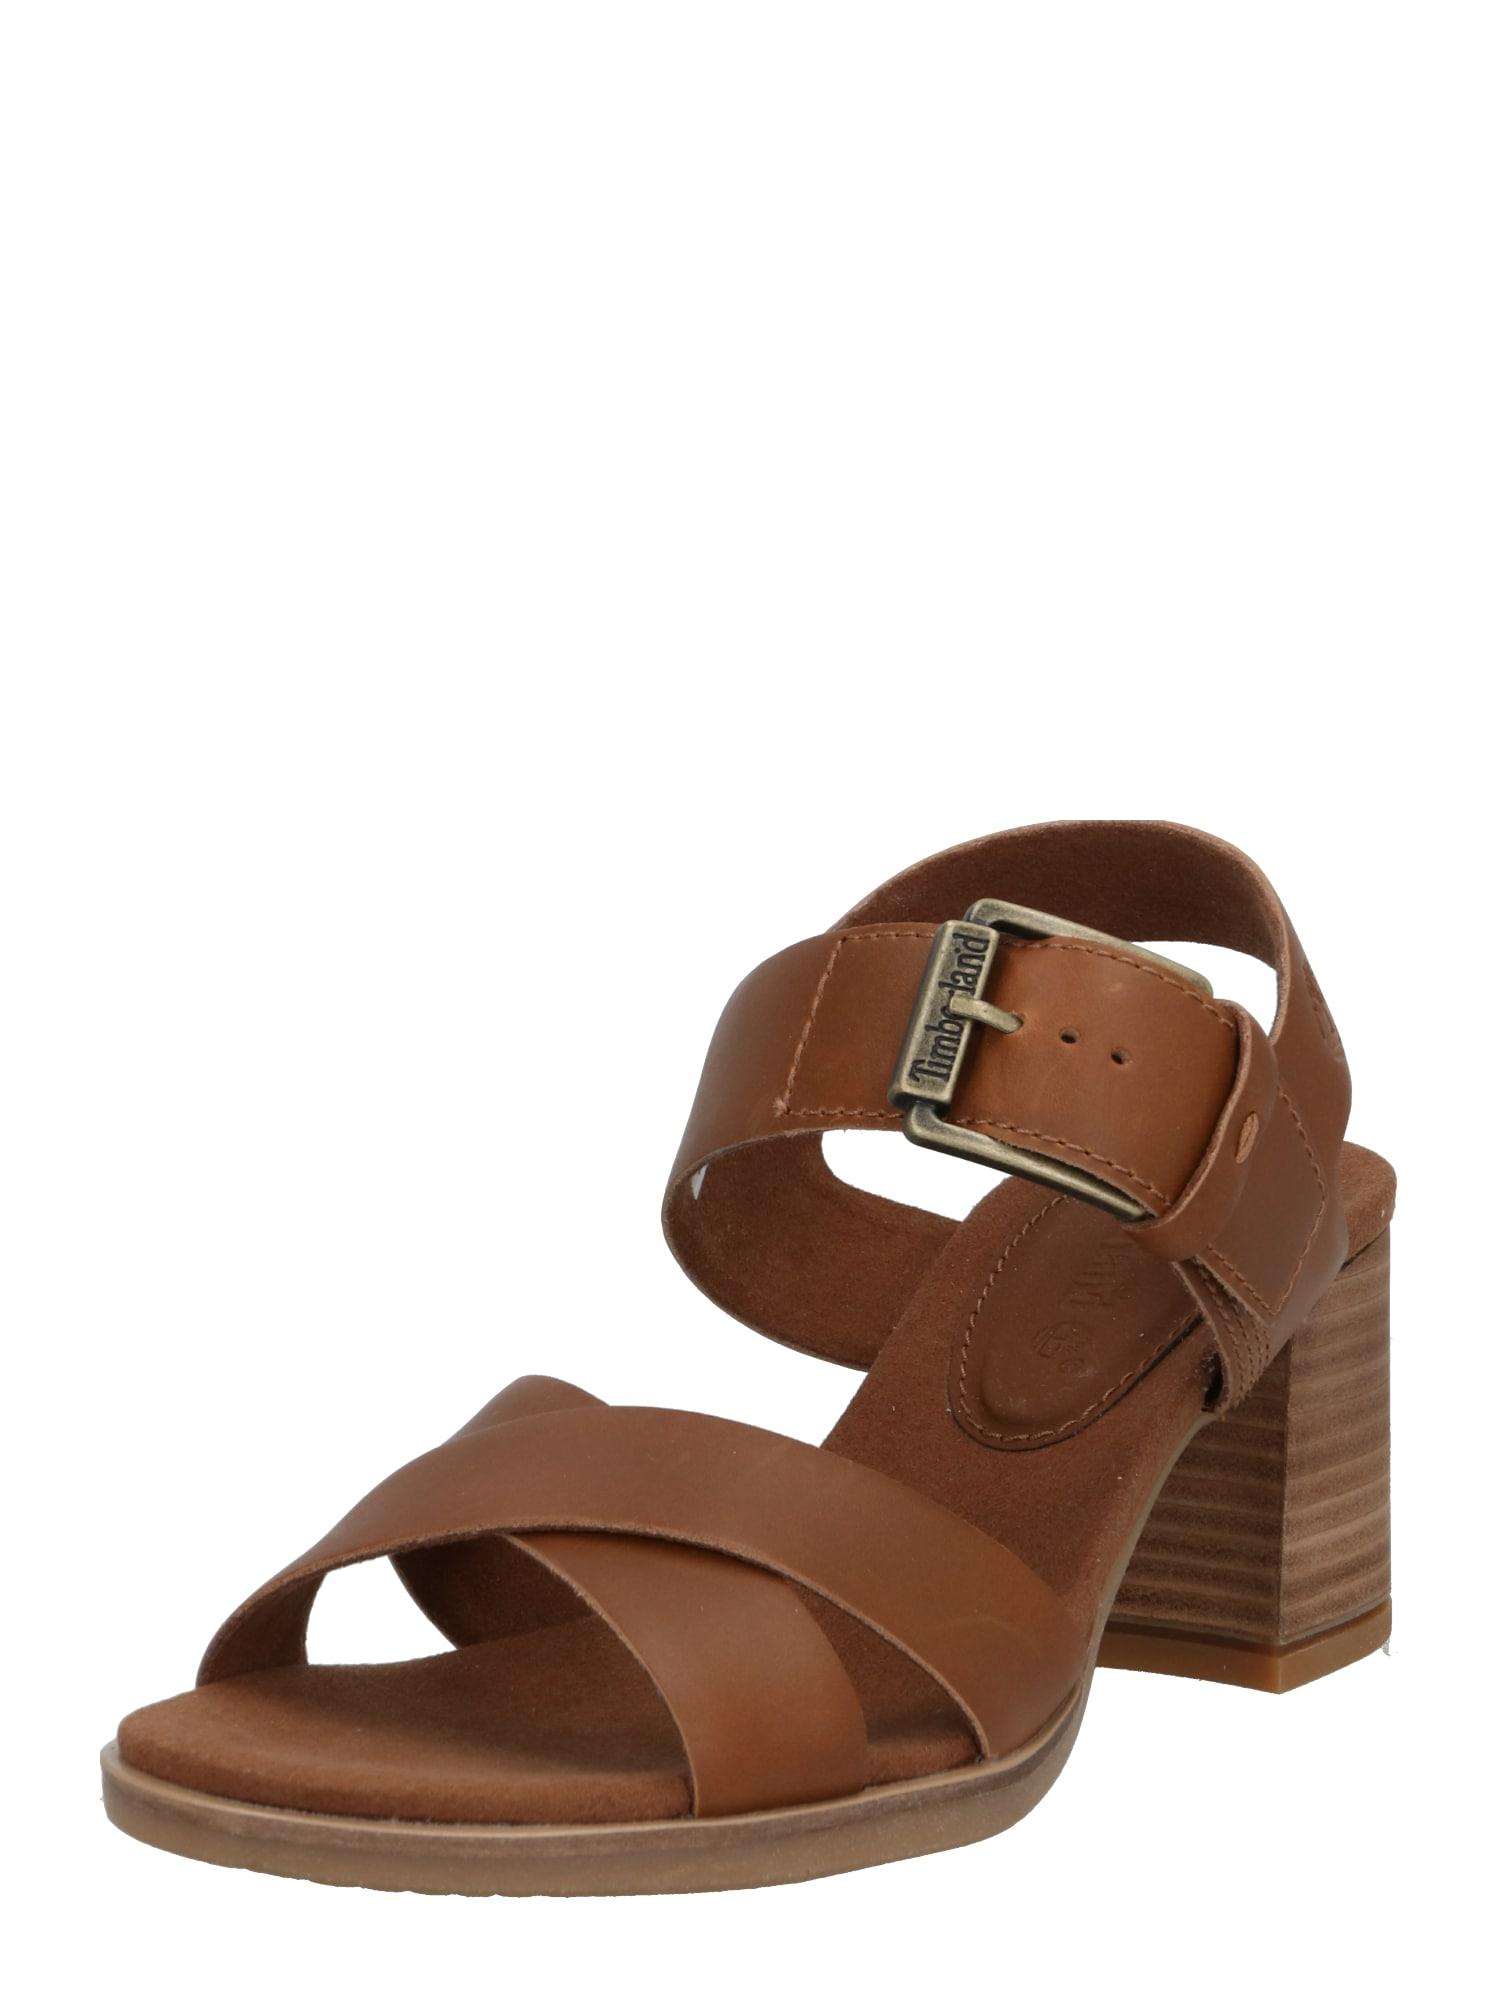 TIMBERLAND Sandále  svetlohnedá / hnedé